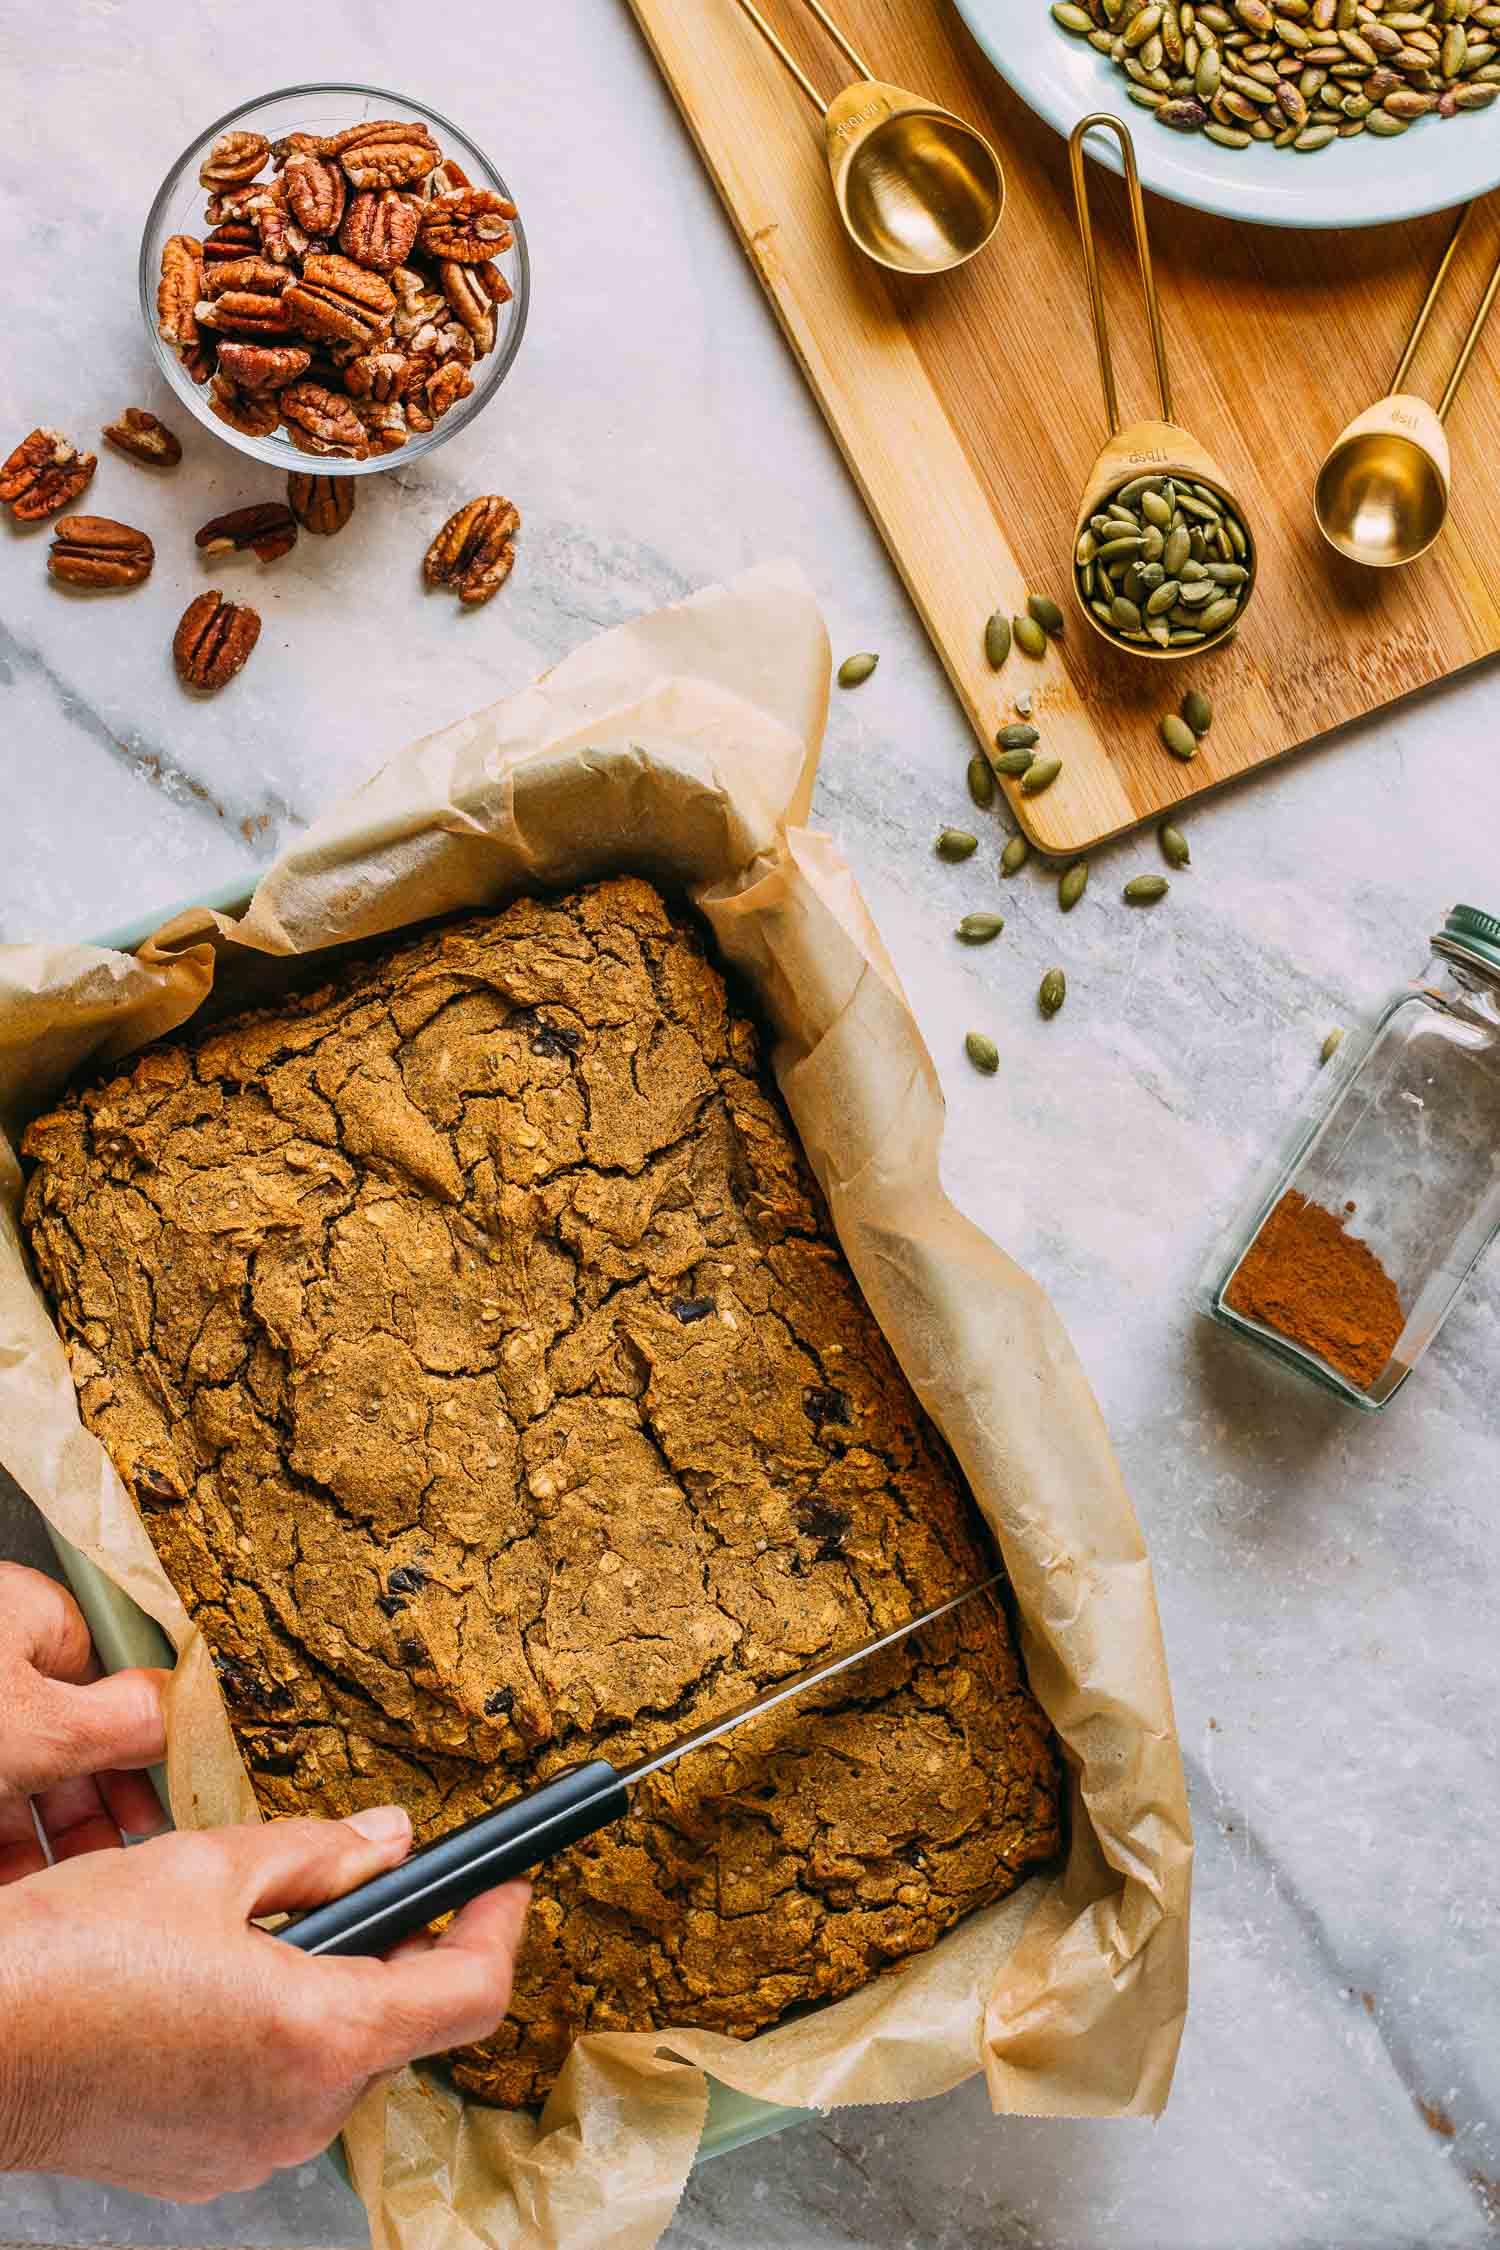 Pumpkin Cinnamon Spice Cake with Cashew Cream Cheese Glaze #pumpkin #cake #cinnamon #spice #cashew #cream #glaze #dairy-free #gluten-free #oil-free #refined sugar-free #plant-based #vegetarian #dessert #breakfast #fall #halloween #harvest #Thanksgiving #Christmas #holidays #recipe #easy #wfpb #recipes #wfpbno #pecans #pumpkinseeds